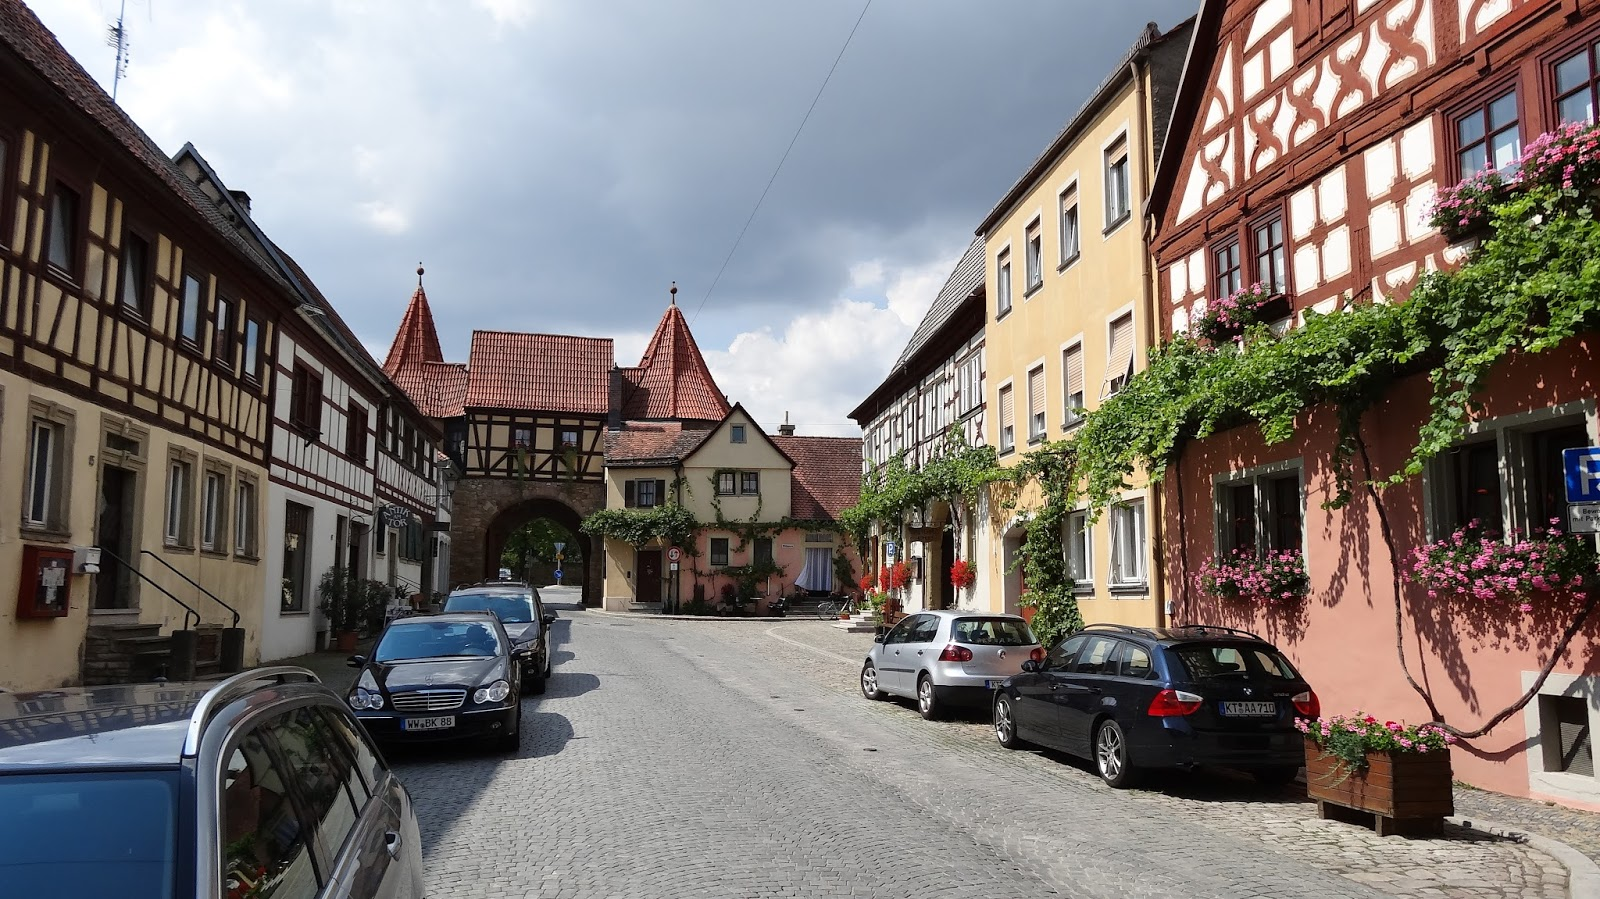 Huren aus Prichsenstadt